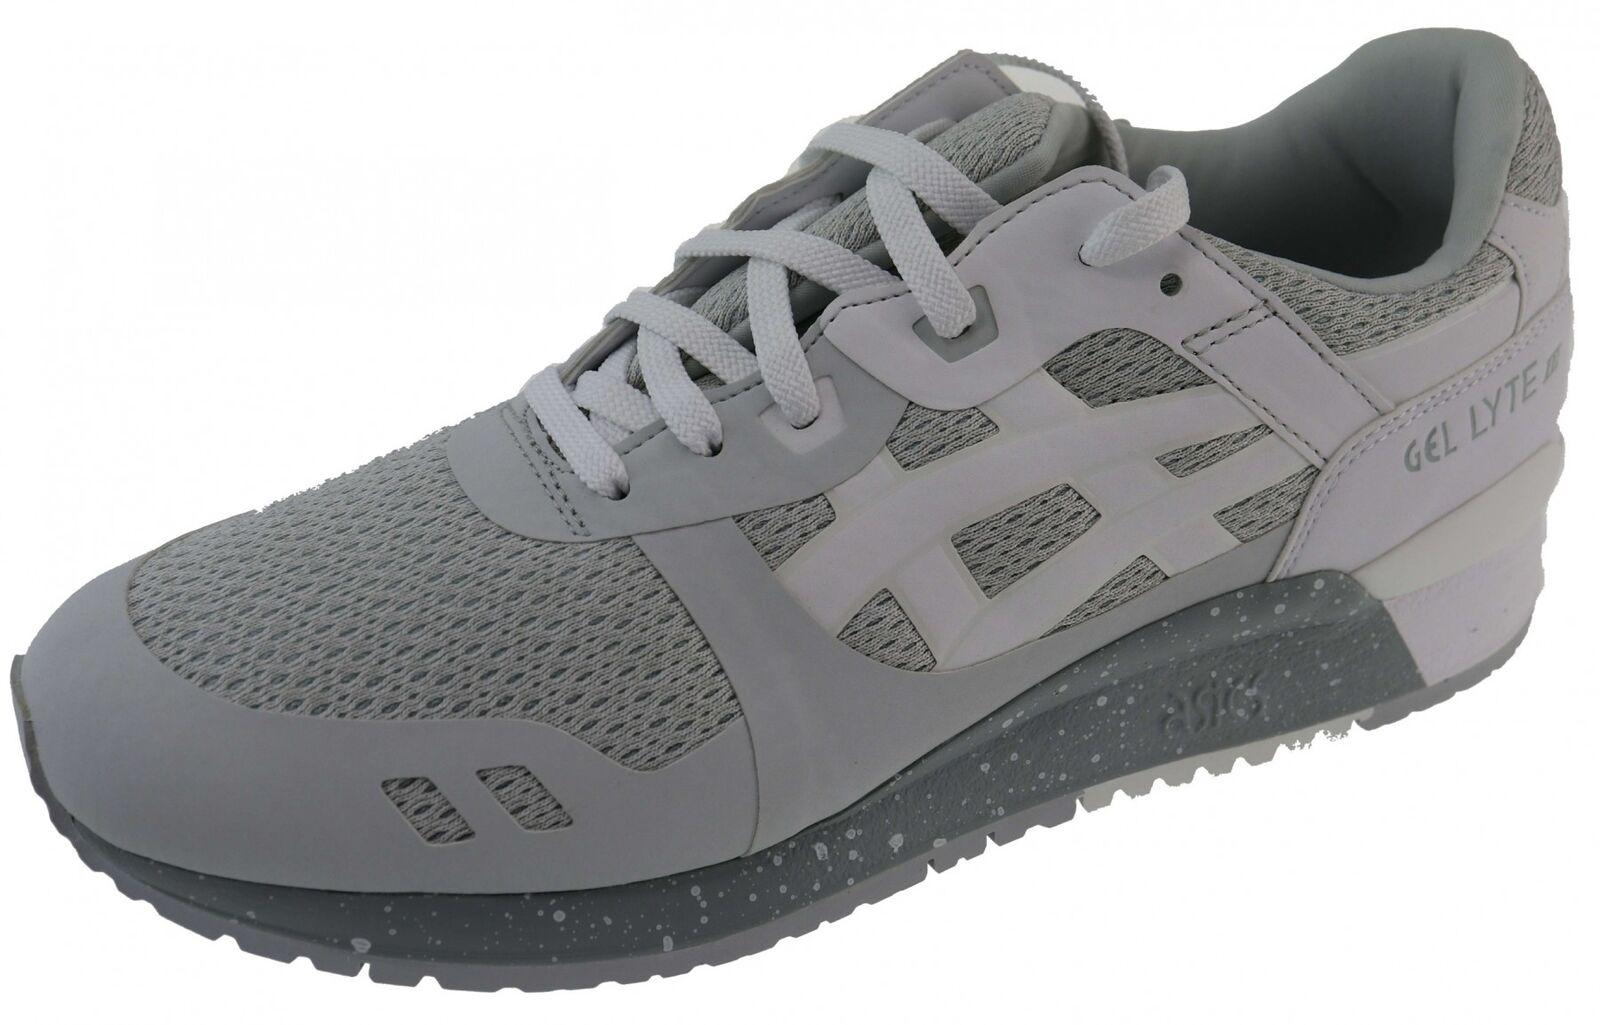 Asic running ghiacciaio gel lyte 3 ns ghiacciaio running bianco grigio gr.46,5 c62a19